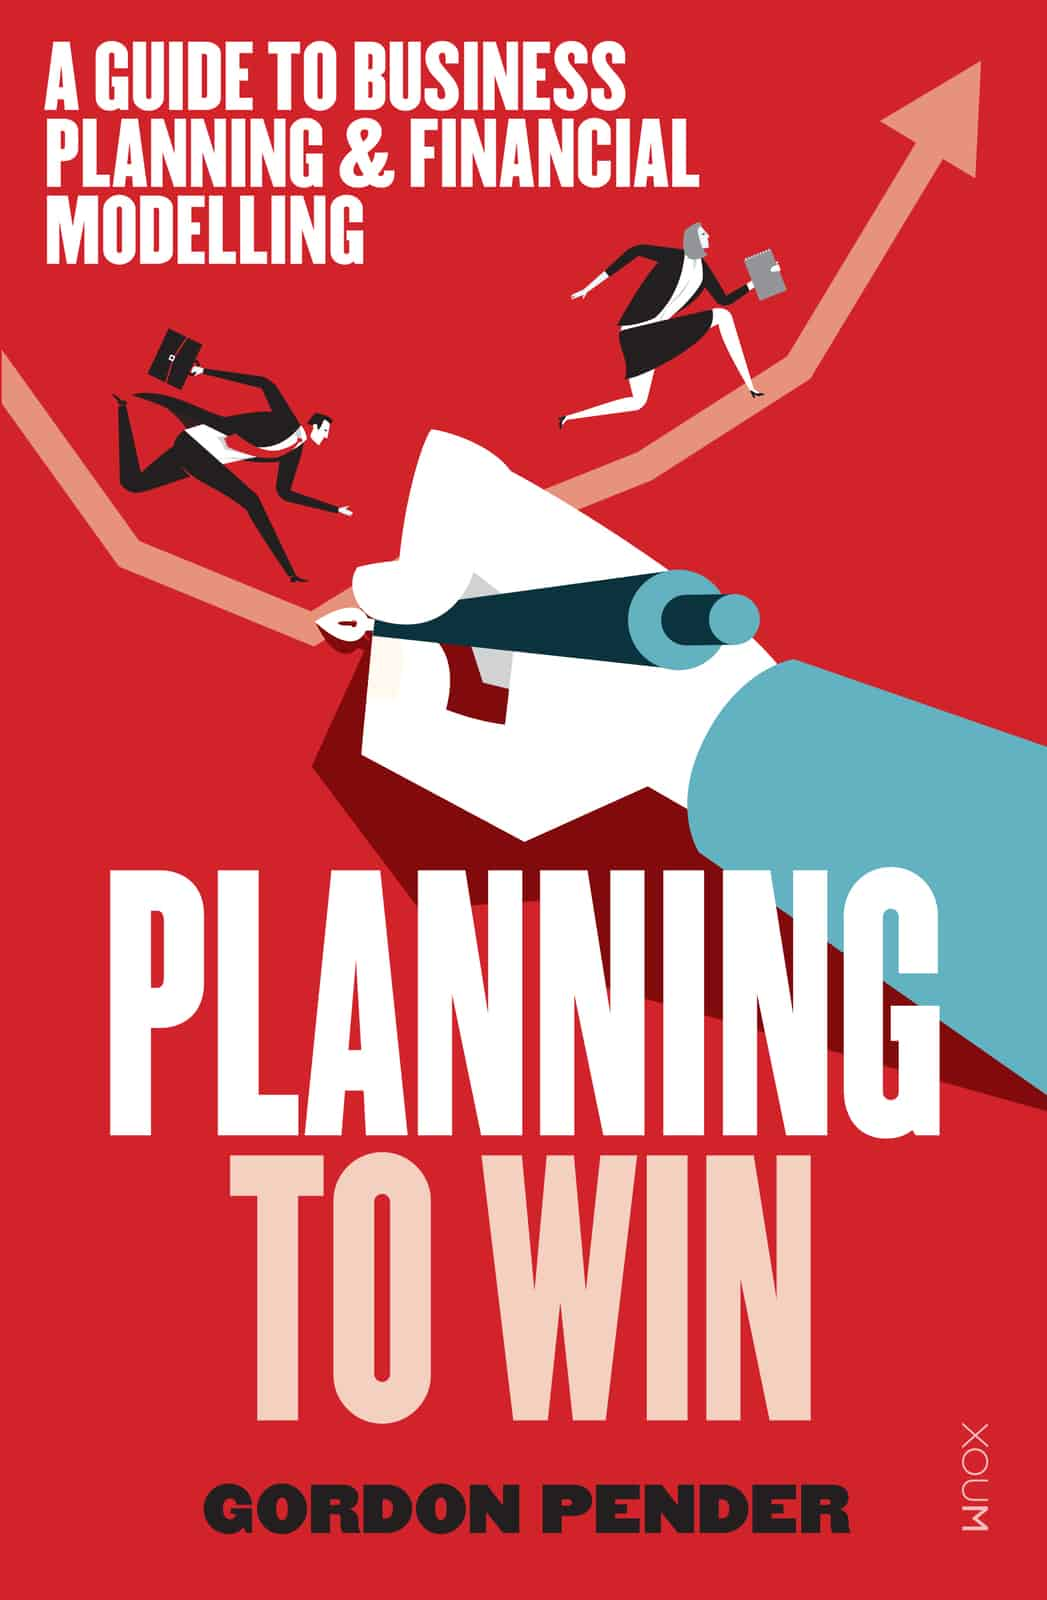 Planning To Win - Business Planning & Management - Gordon Pender